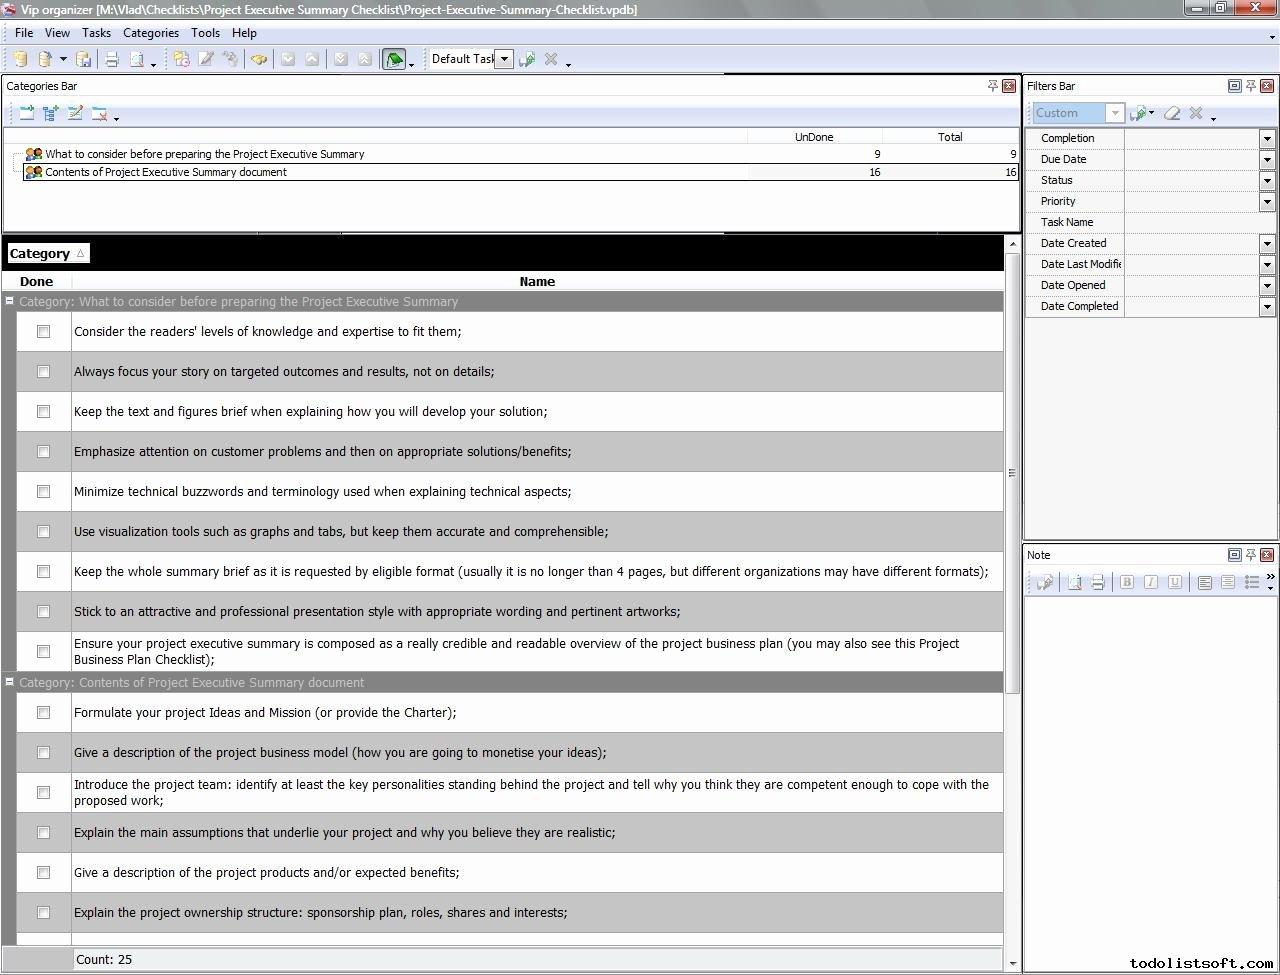 Project Executive Summary Checklist to Do List